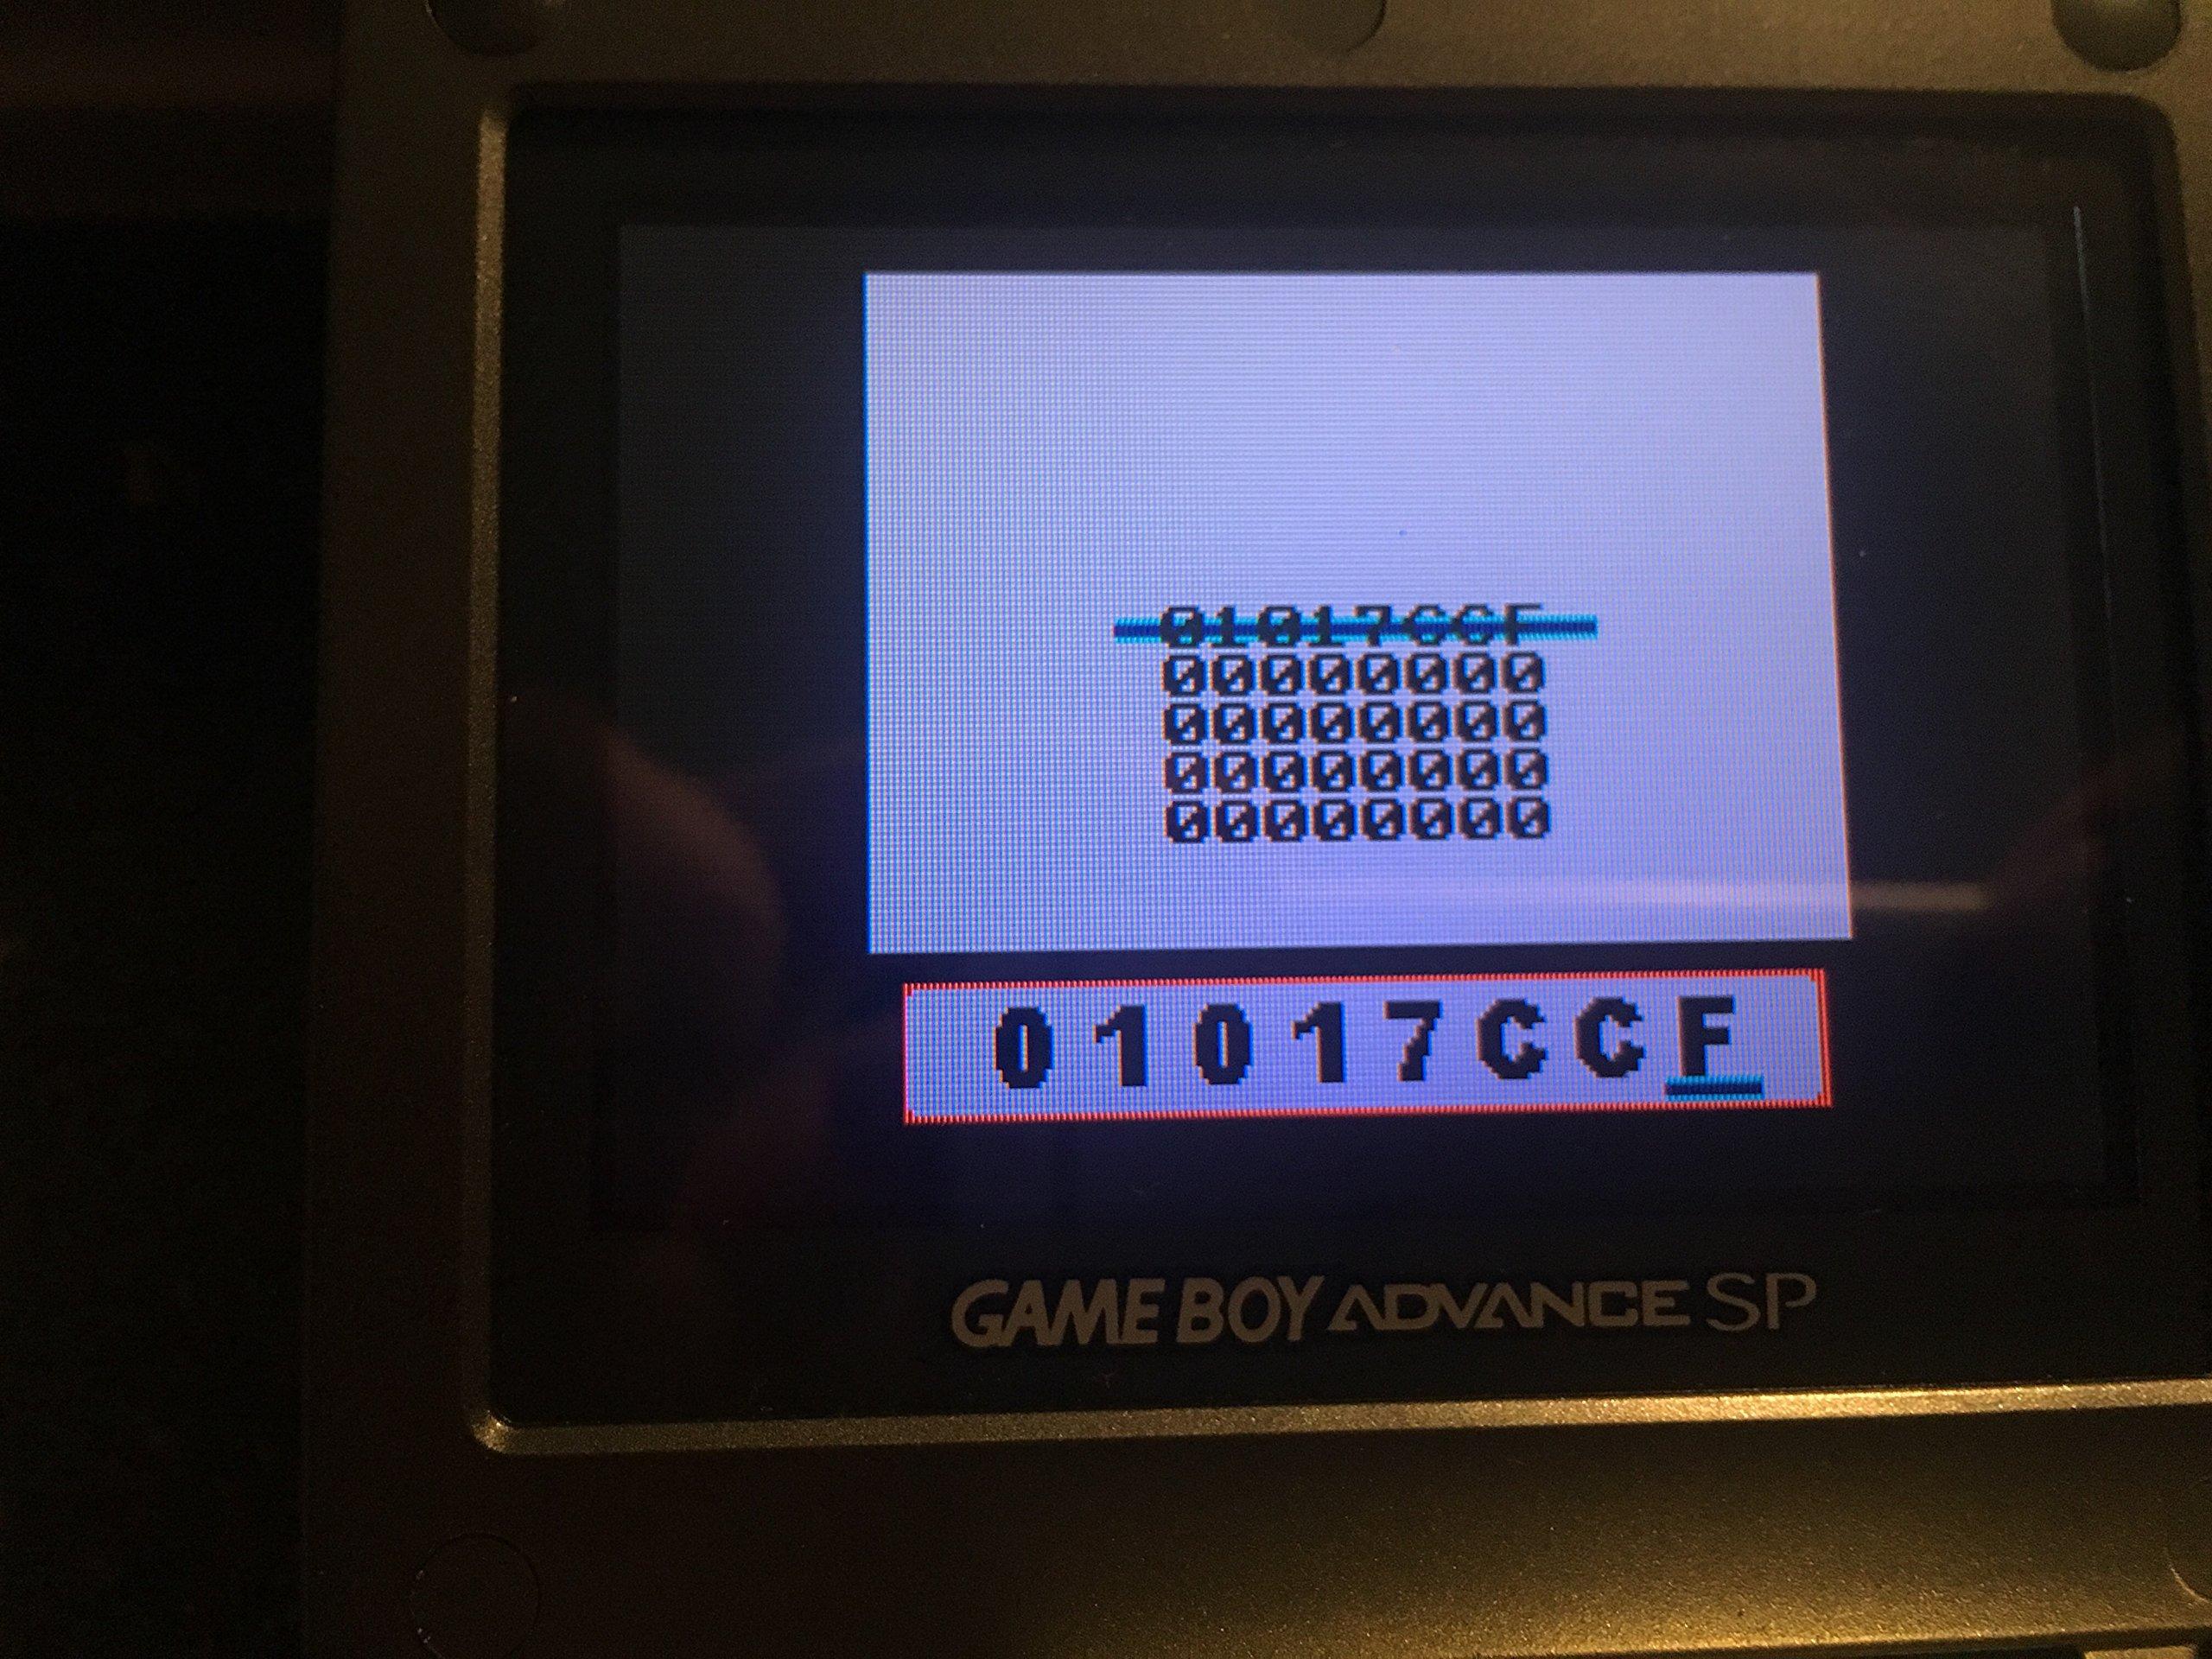 Game boy color game genie codes - Image Unavailable Image Not Available For Color Gameshark For Game Boy